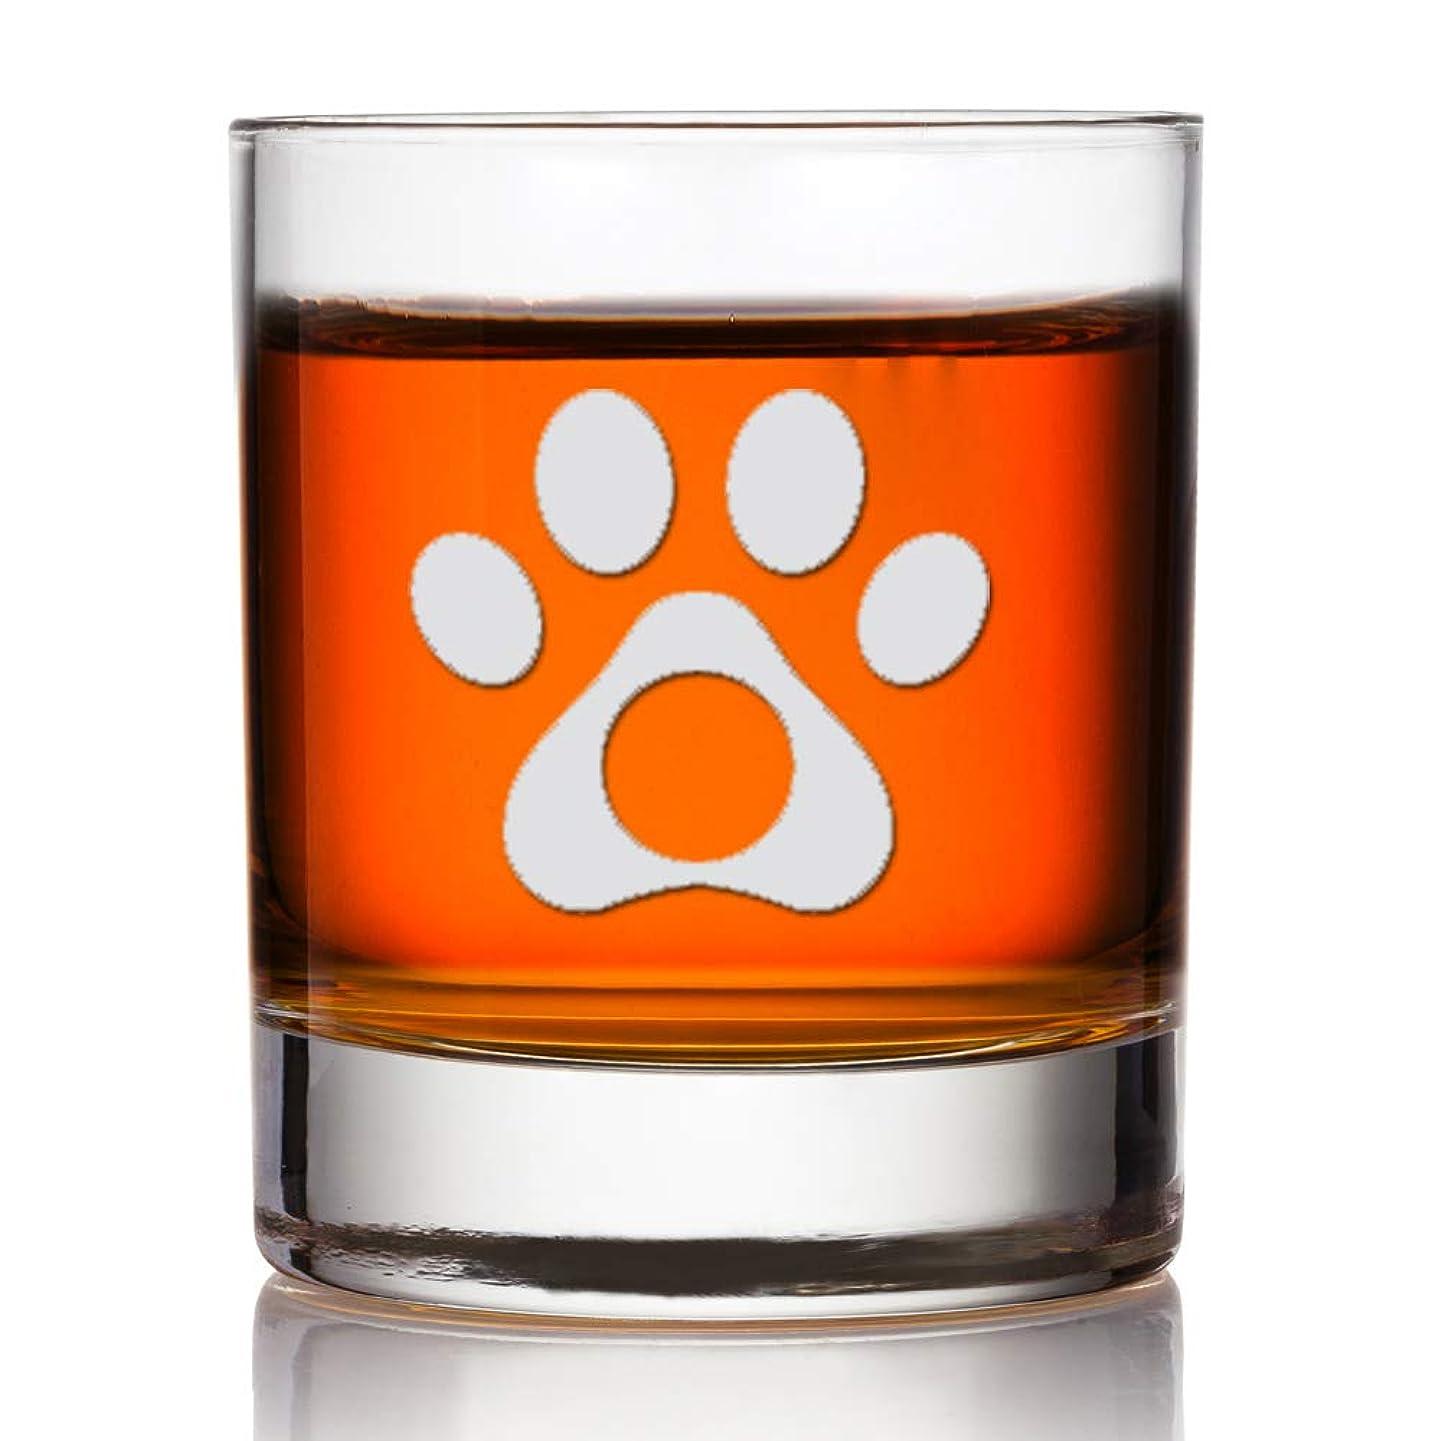 Monogram Dog Paw Print Whiskey Rocks Glass 10oz - Engraved Whiskey Cocktails Glass Gift -2 Pcs Per Set.